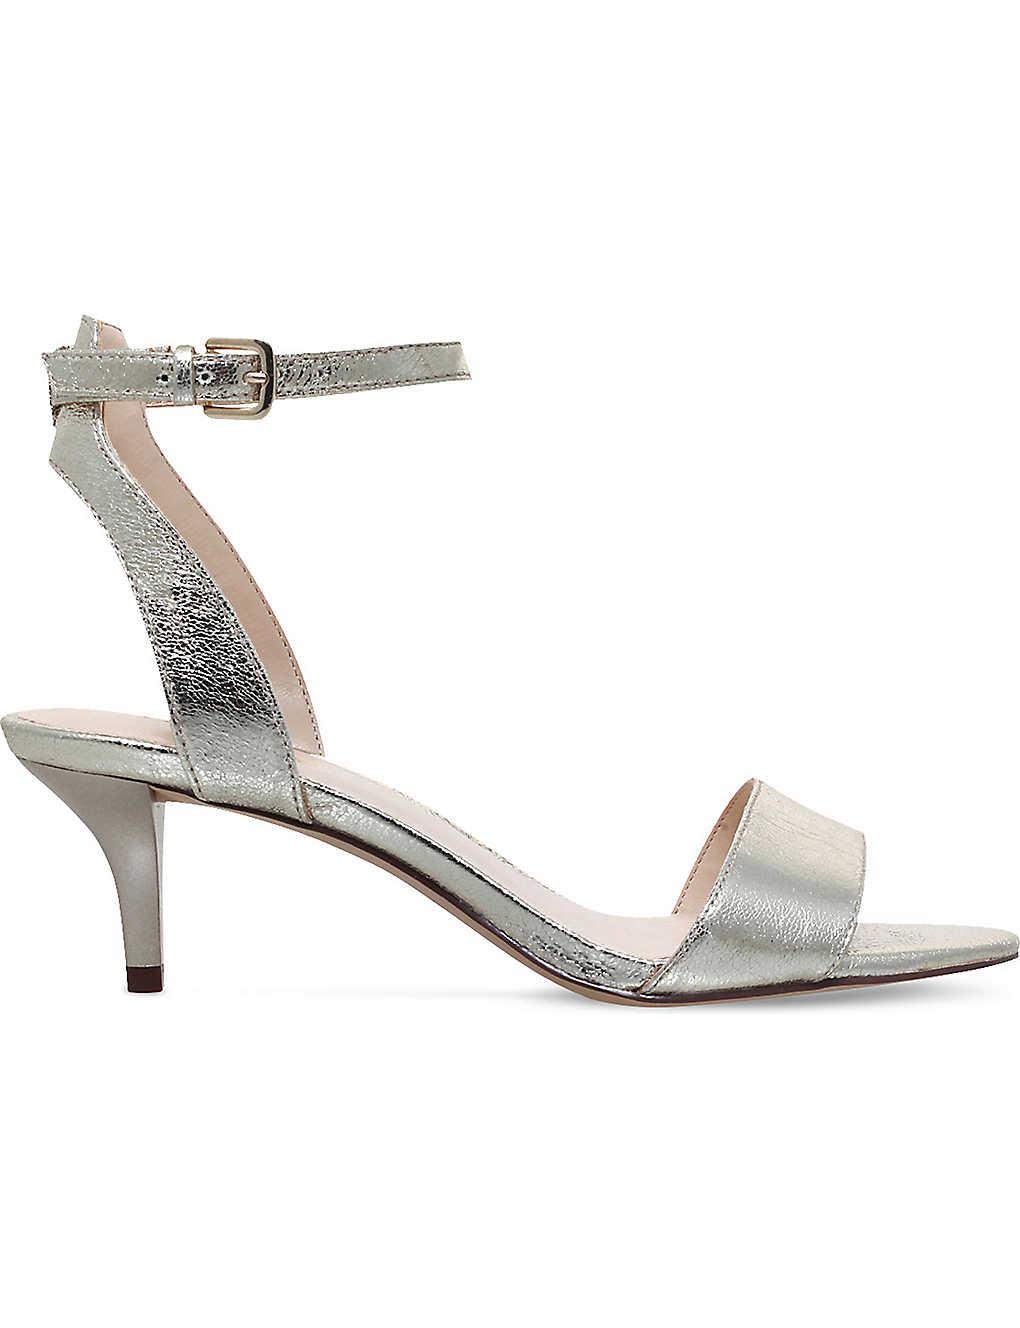 Gold NINE WEST Lesia metallic sandals